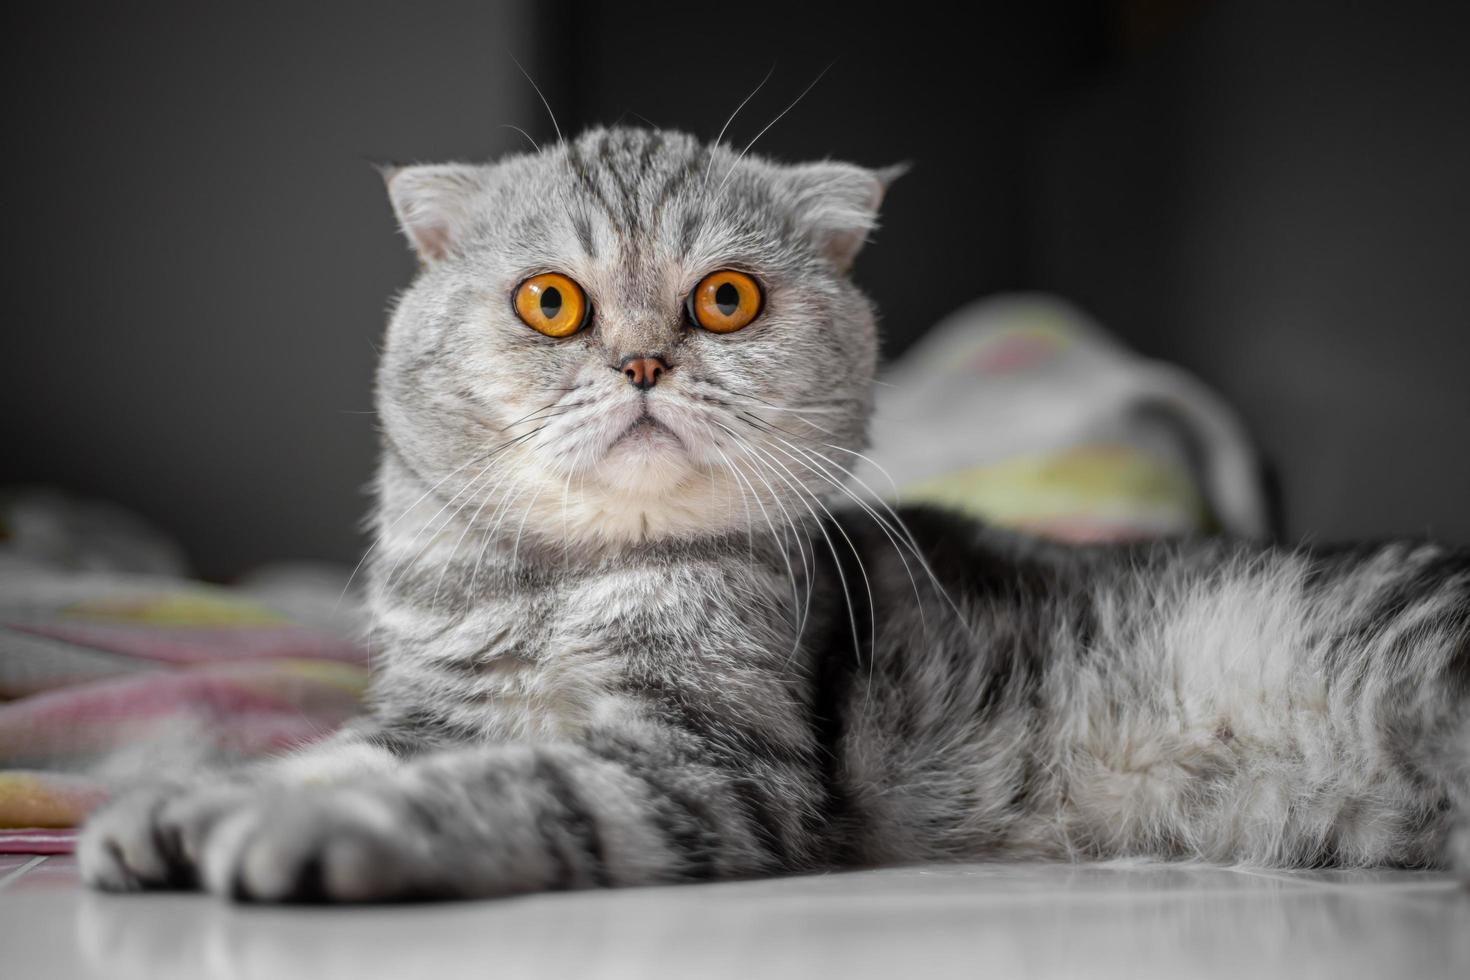 Scottish Fold cat at attention photo